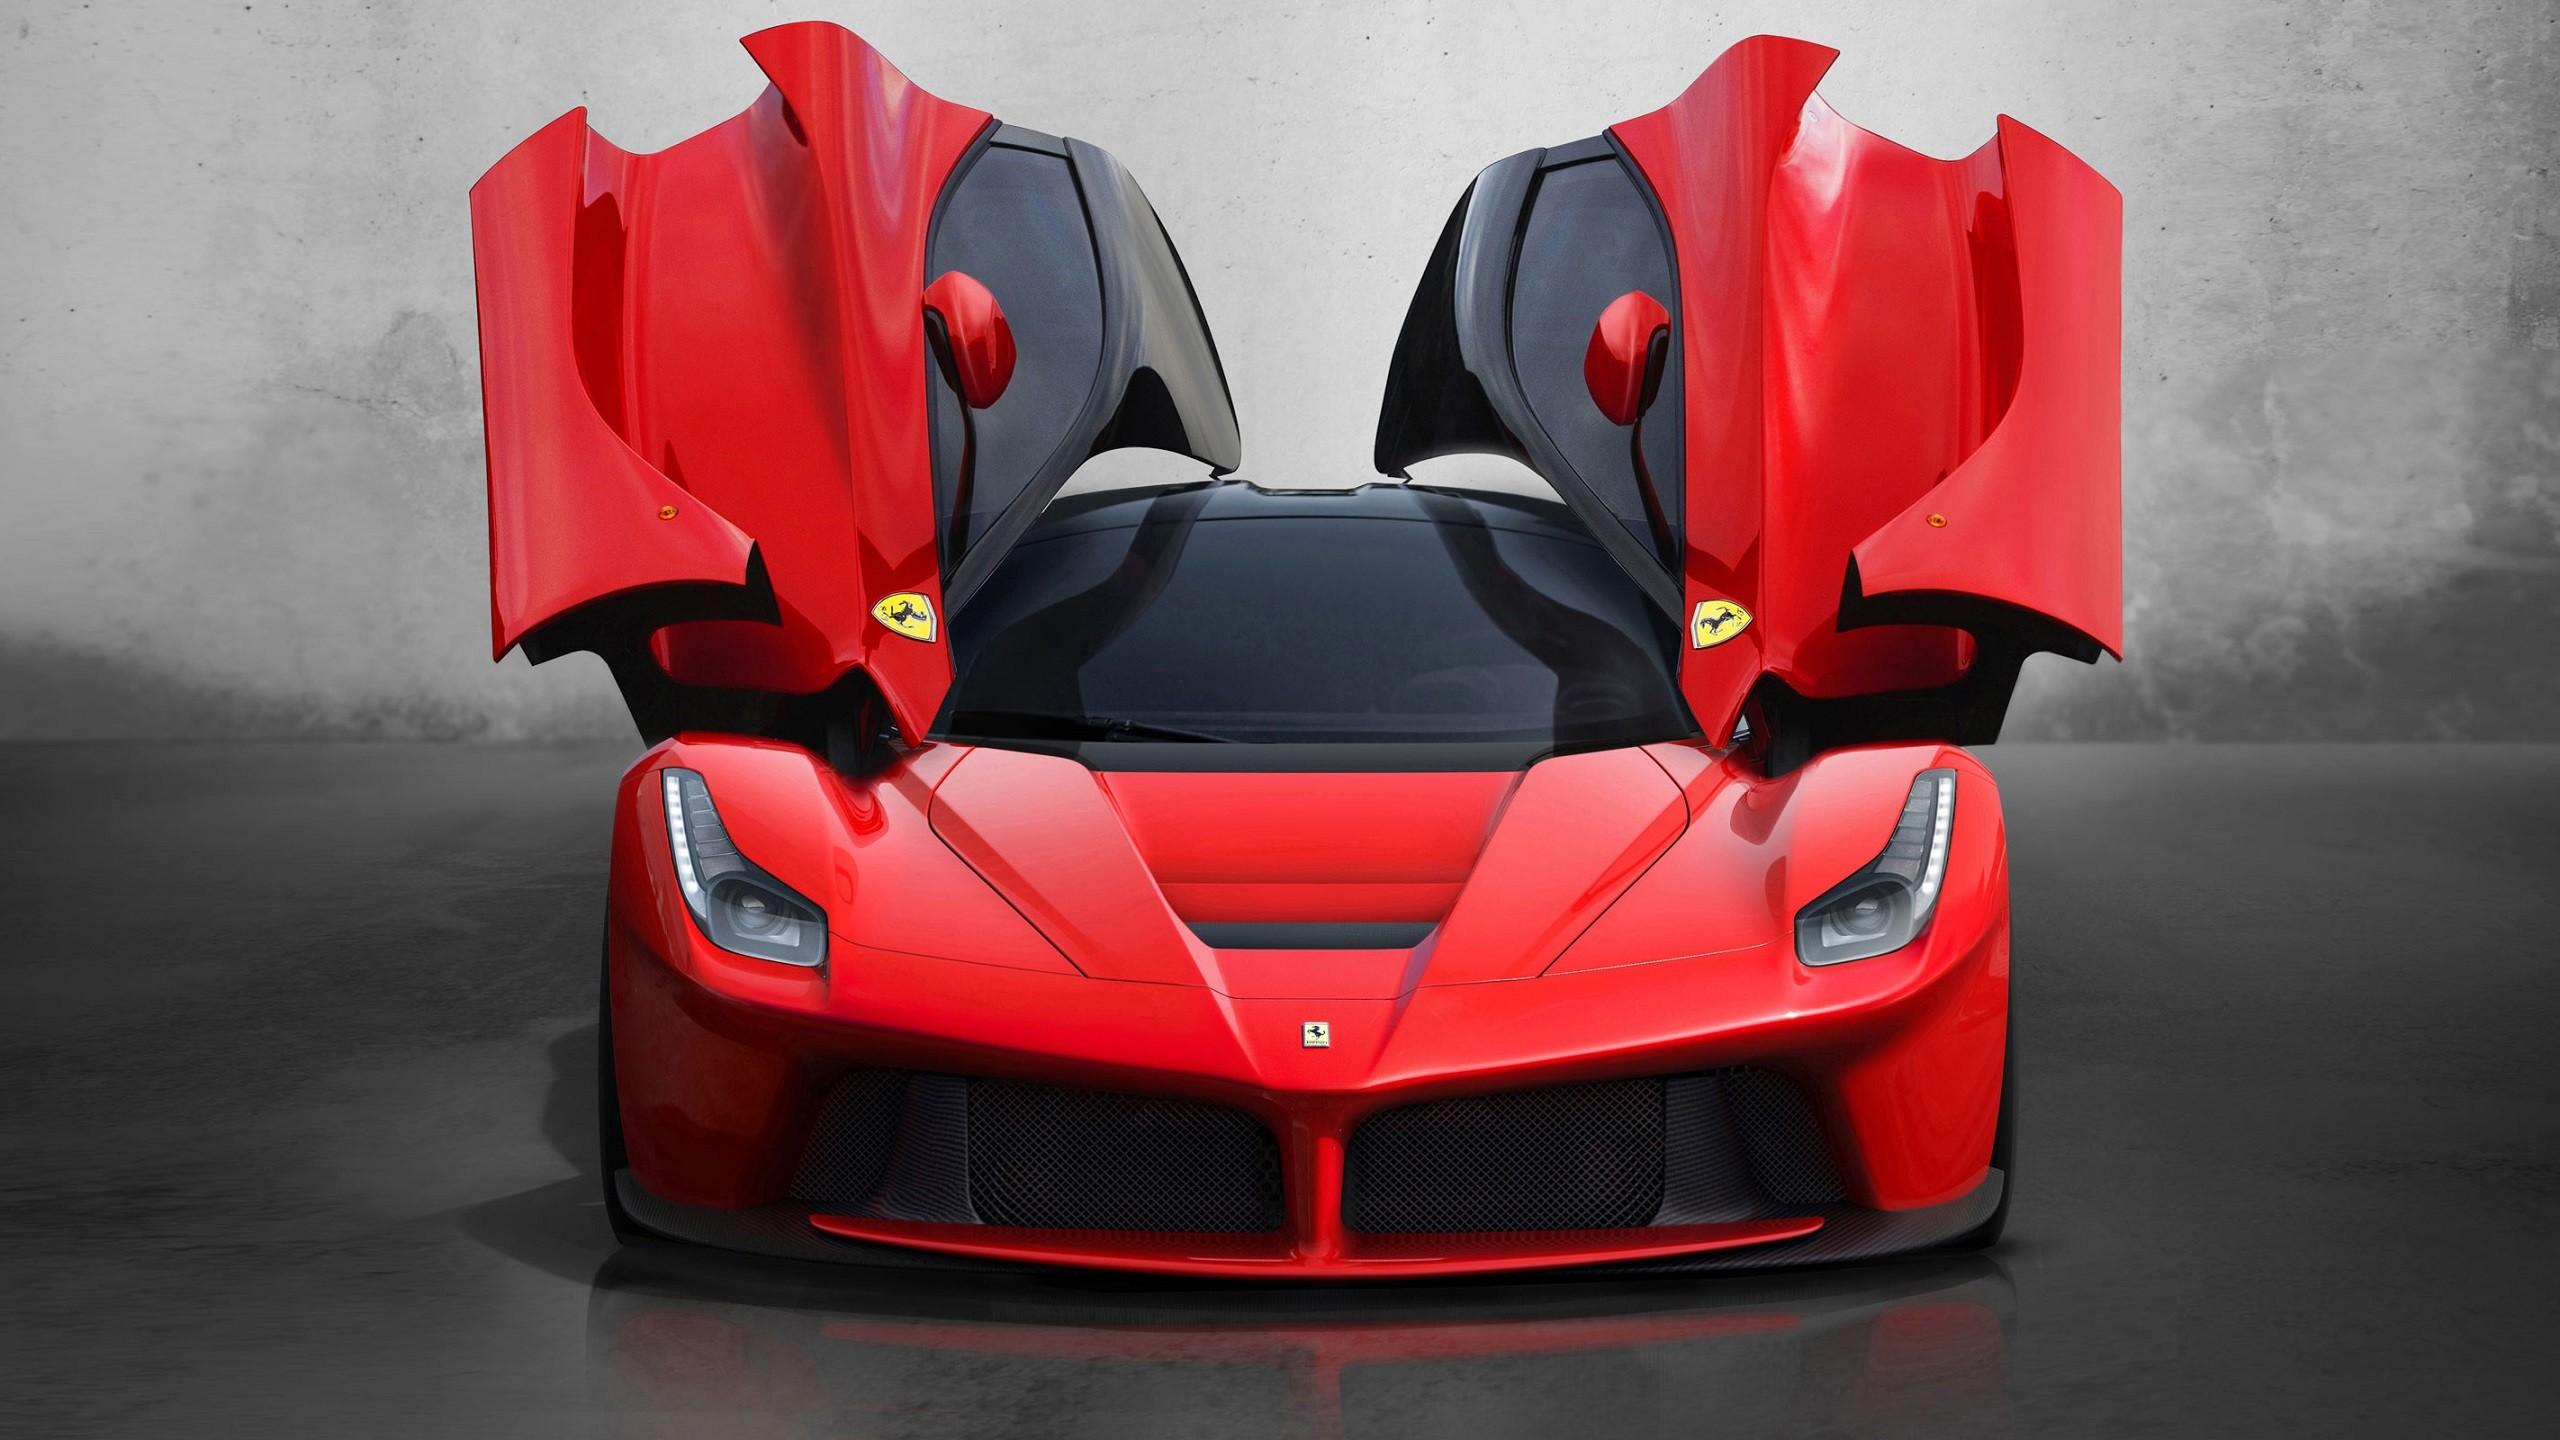 Ferrari F8 Tributo Rouge Photo Wallpaper Fond Ecran Hd